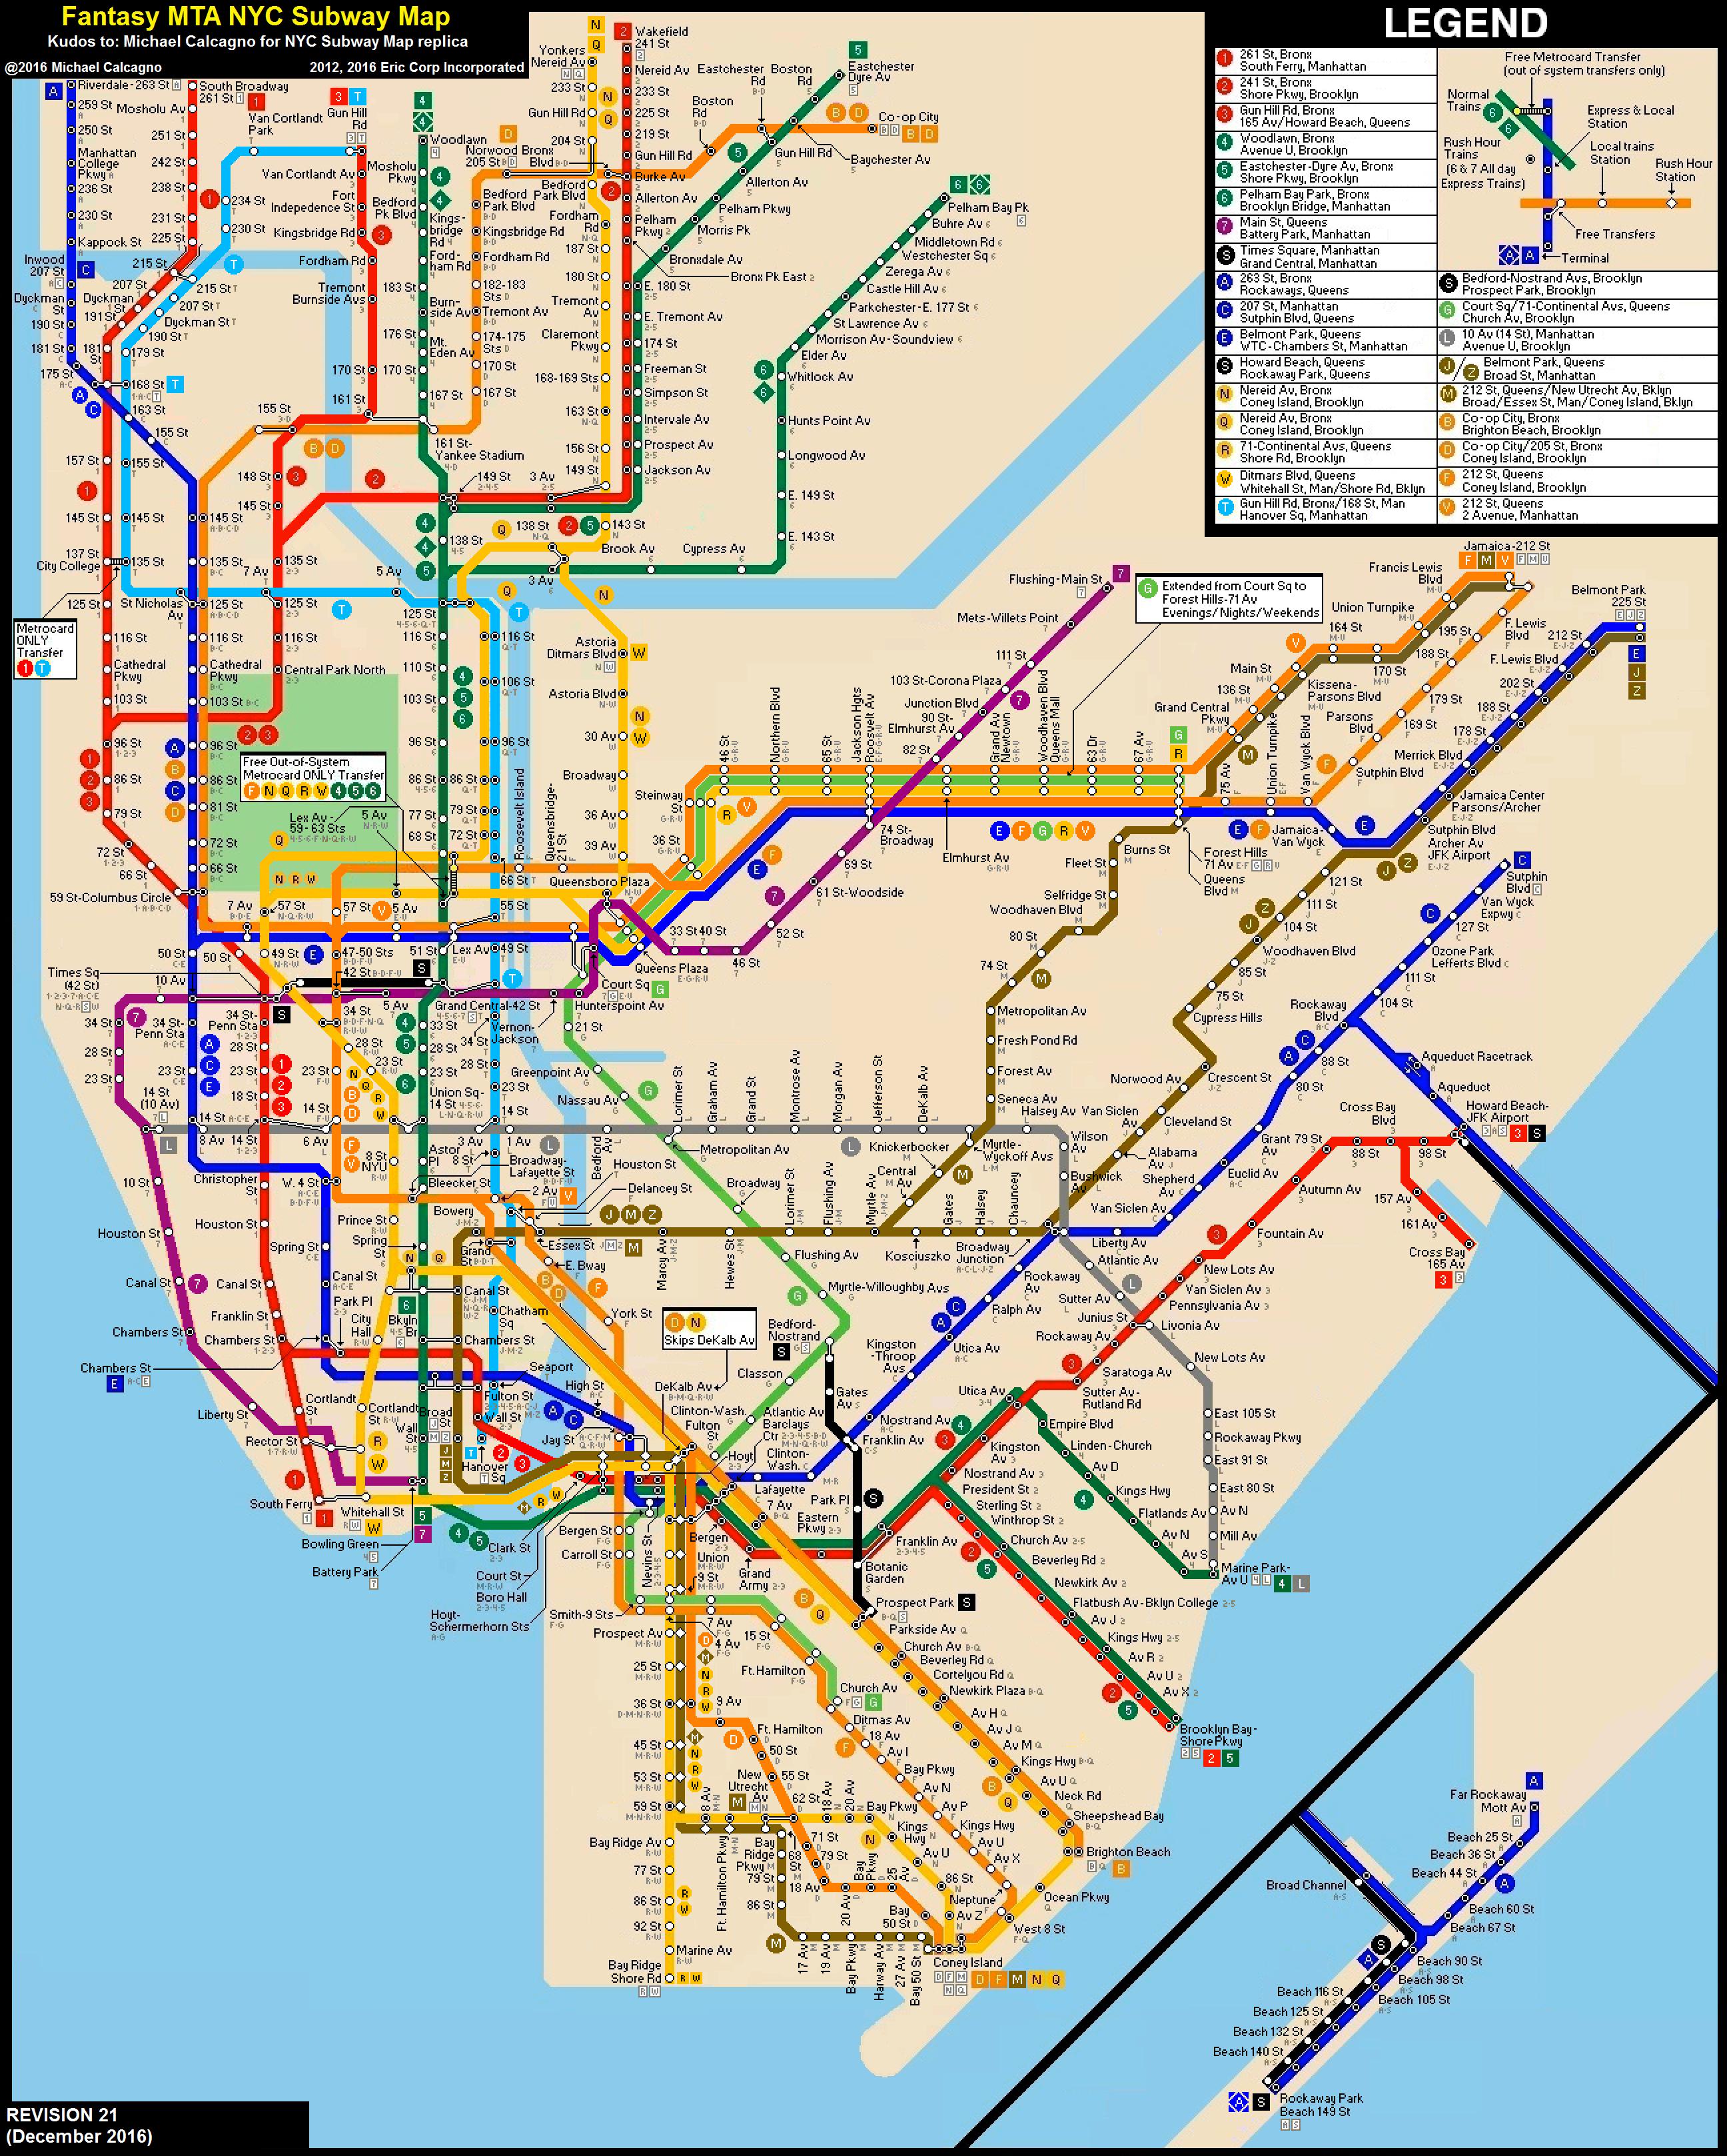 New Nyc Subway Map 2017.Nyc Subway Fantasy Map Revision 21 By Ecinc2xxx On Deviantart